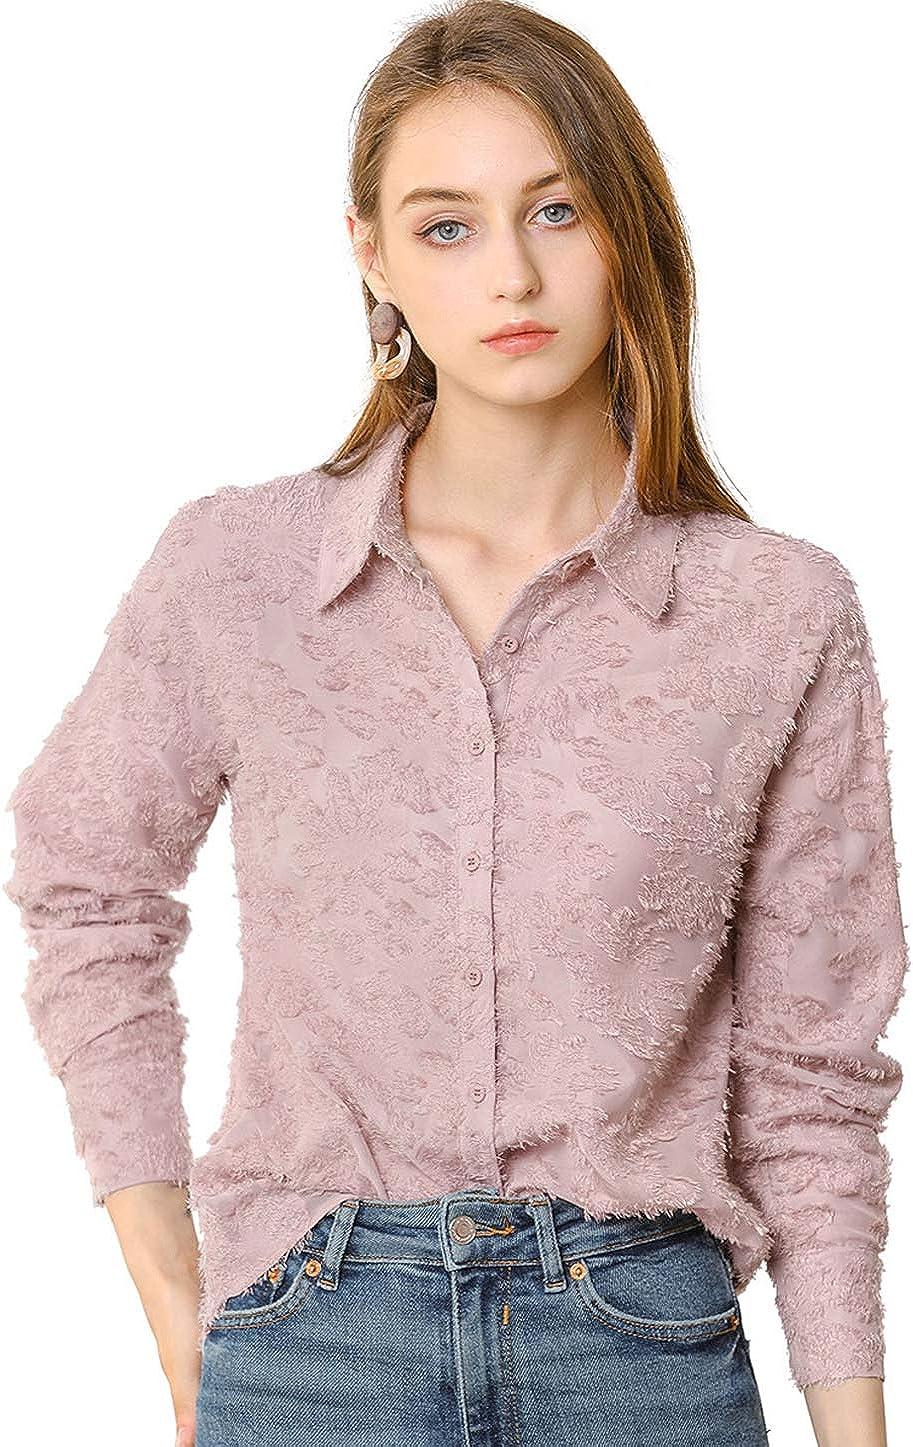 Allegra K Women's Floral Textured Blouse Point Collar Button Down Shirt